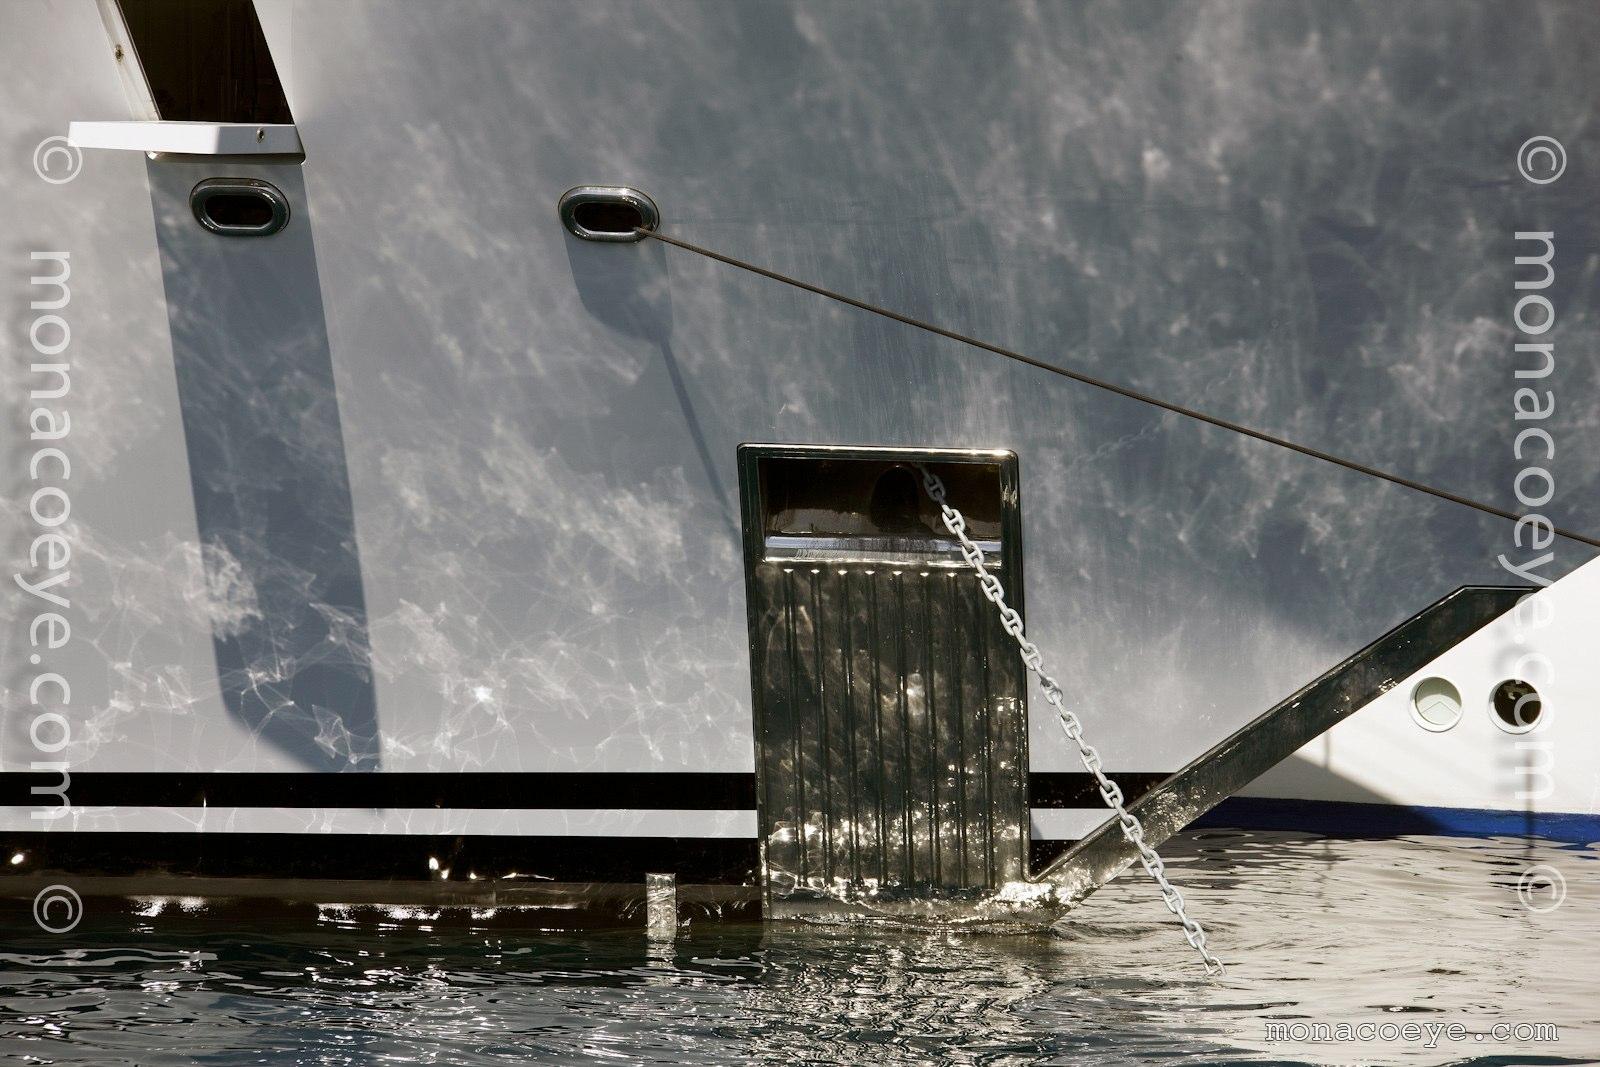 Valerie, 2011 design from Espen Øino and Reymond Langton